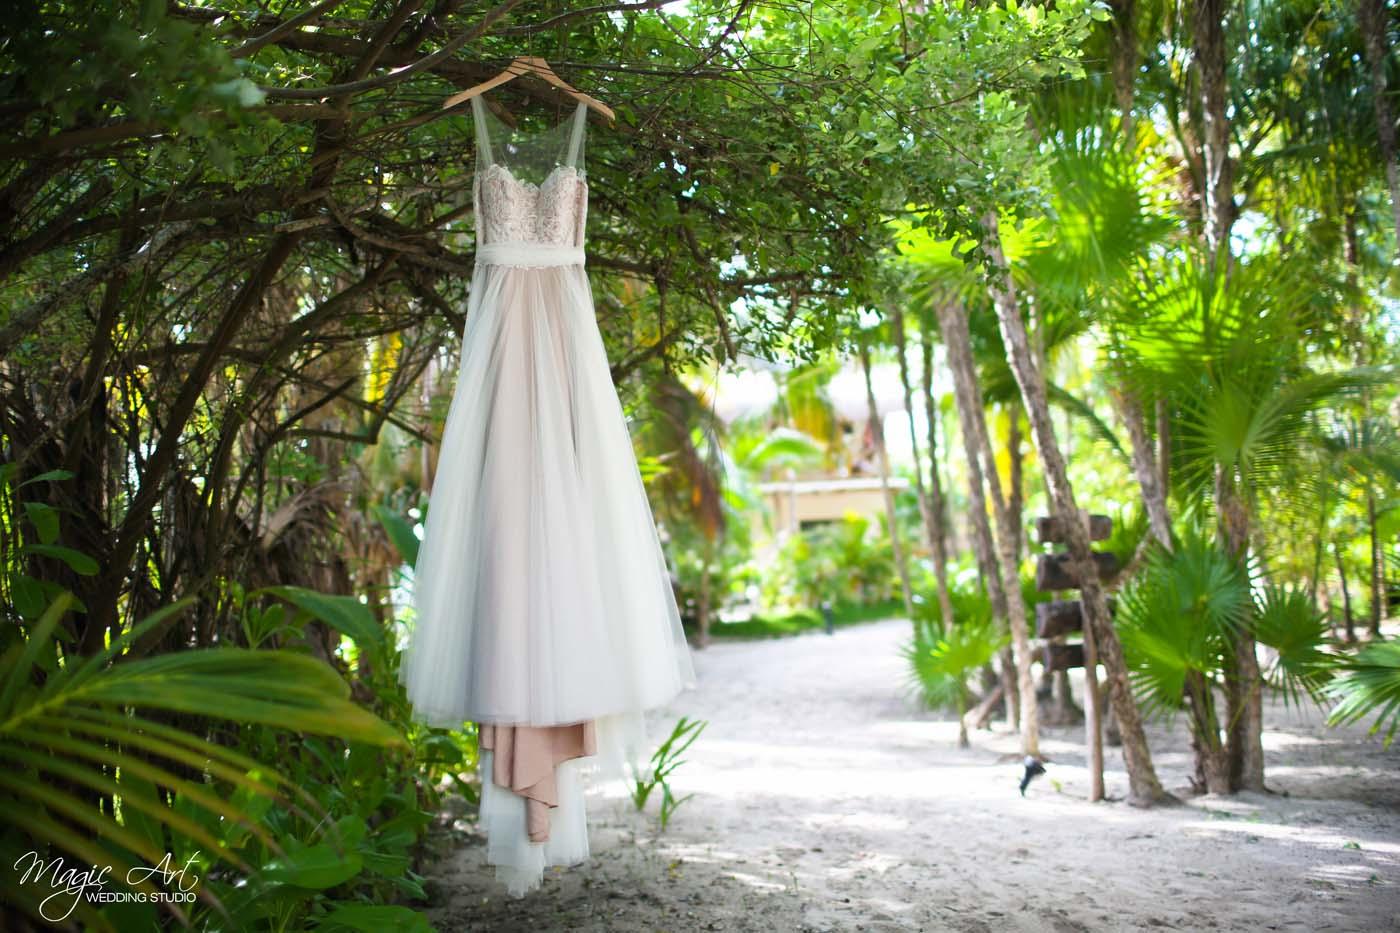 Riviera maya wedding photographer cris niko for Riviera maya wedding photographer